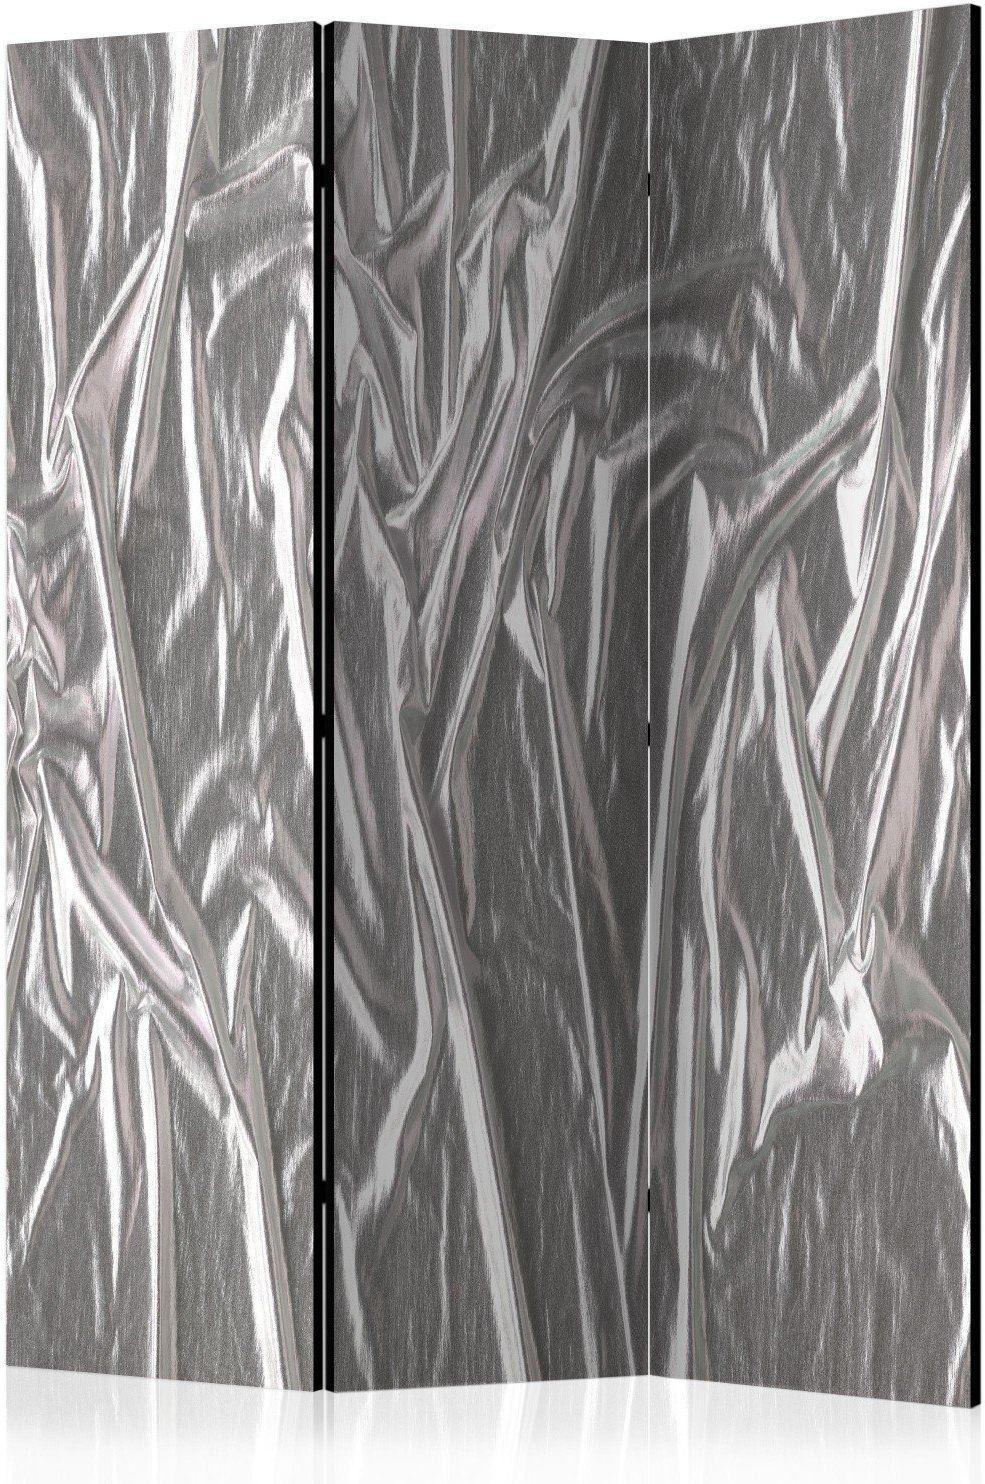 Parawan 3-częściowy - szlachetne srebro [room dividers]